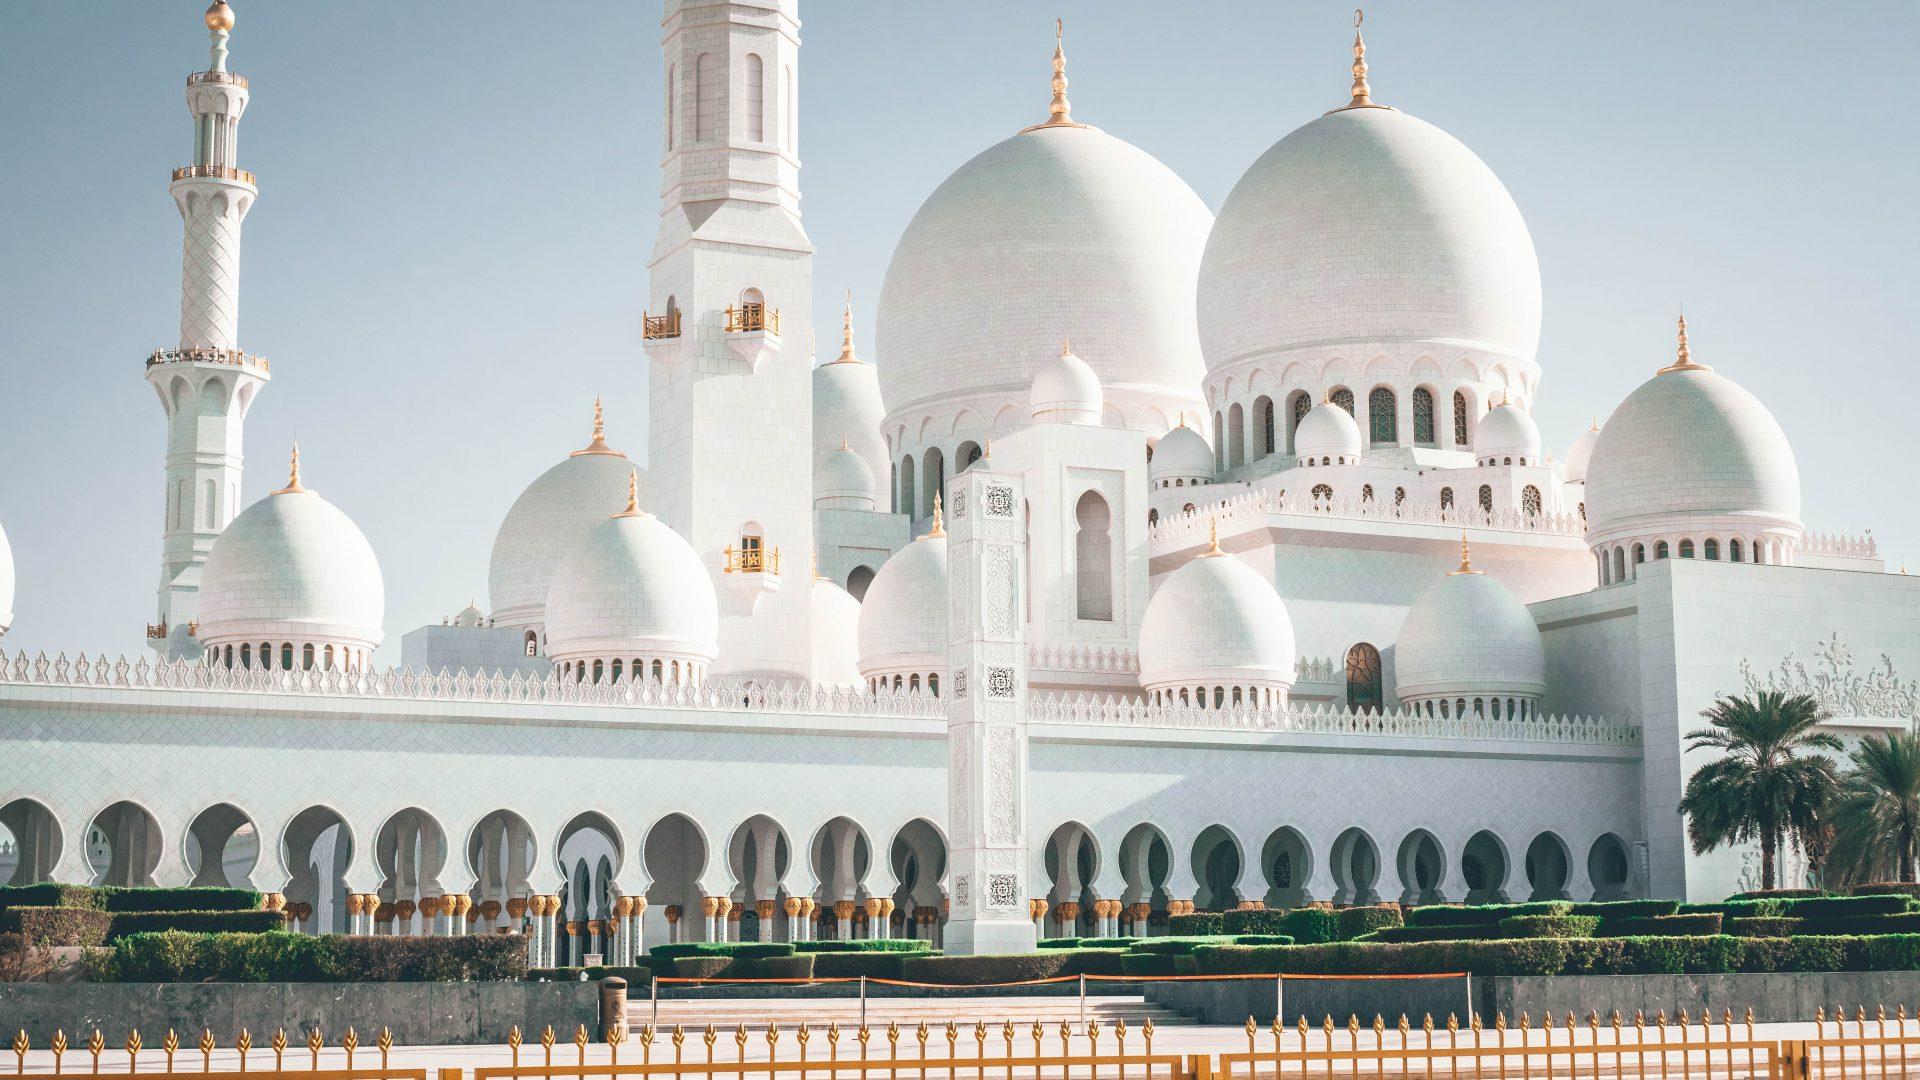 Excursión a la Mezquita de Sheikh Zayed en Abu Dhabi